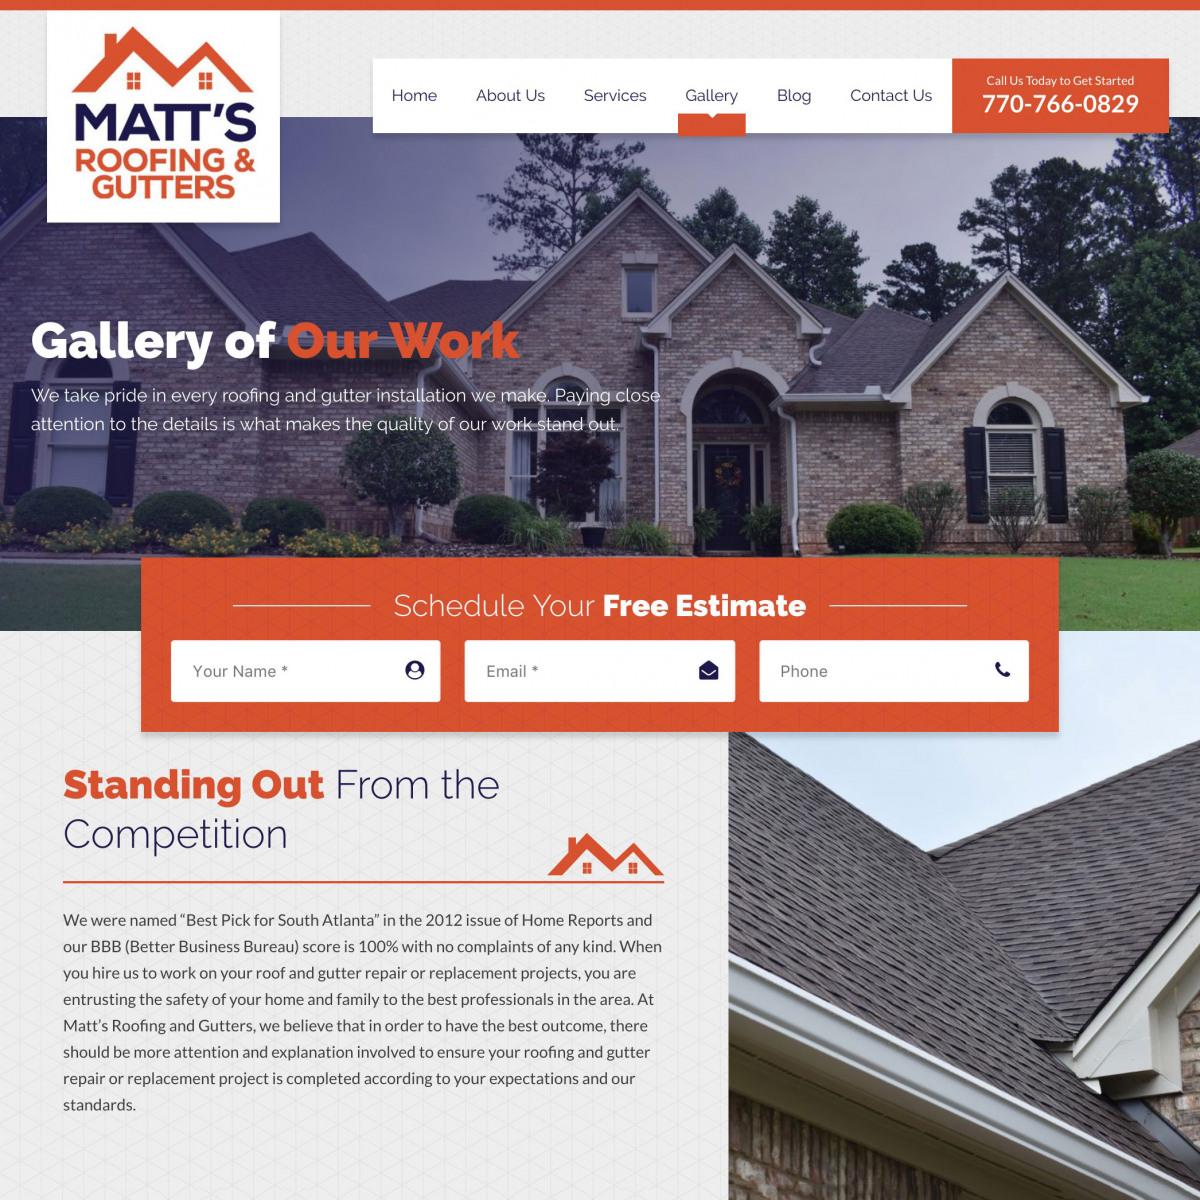 Image of website for Matt's Roofing & Gutters